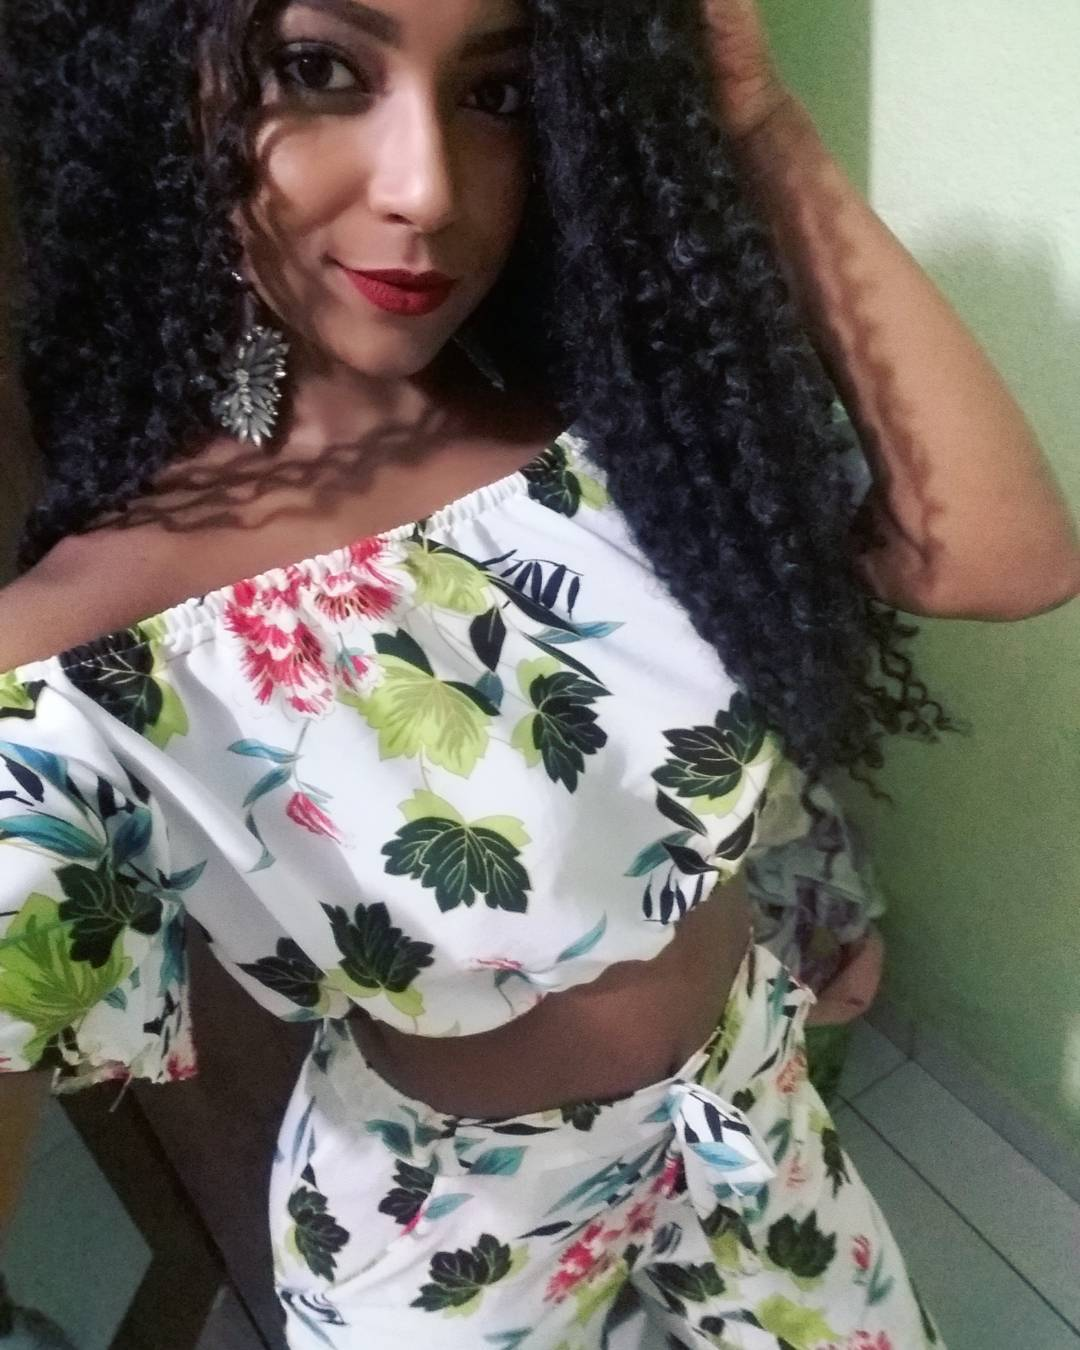 caroline ferreira, miss rondonia mundo 2018. - Página 2 25026310